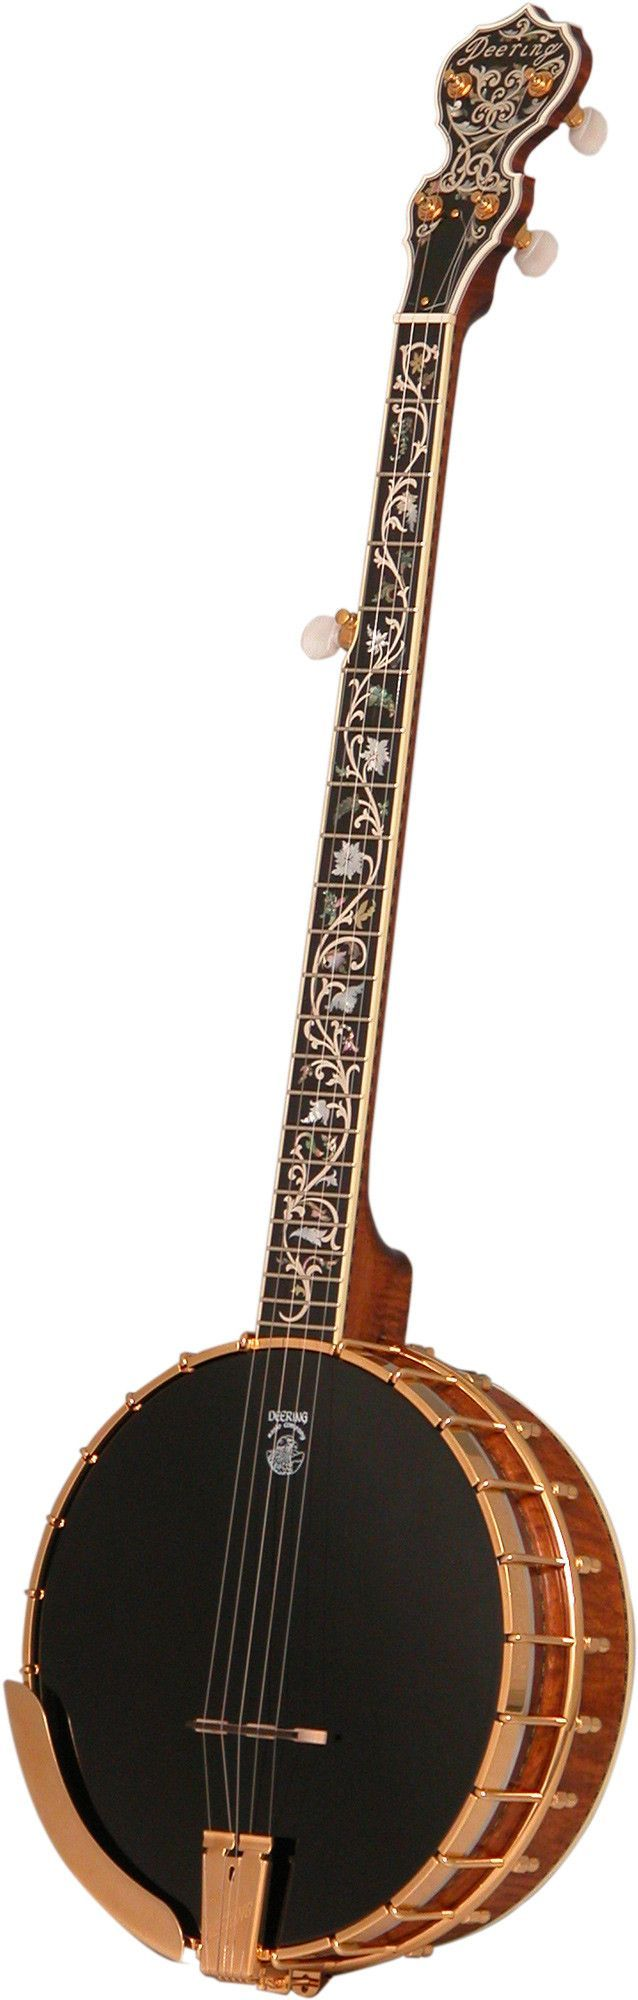 Deering David Holt Signature Banjo